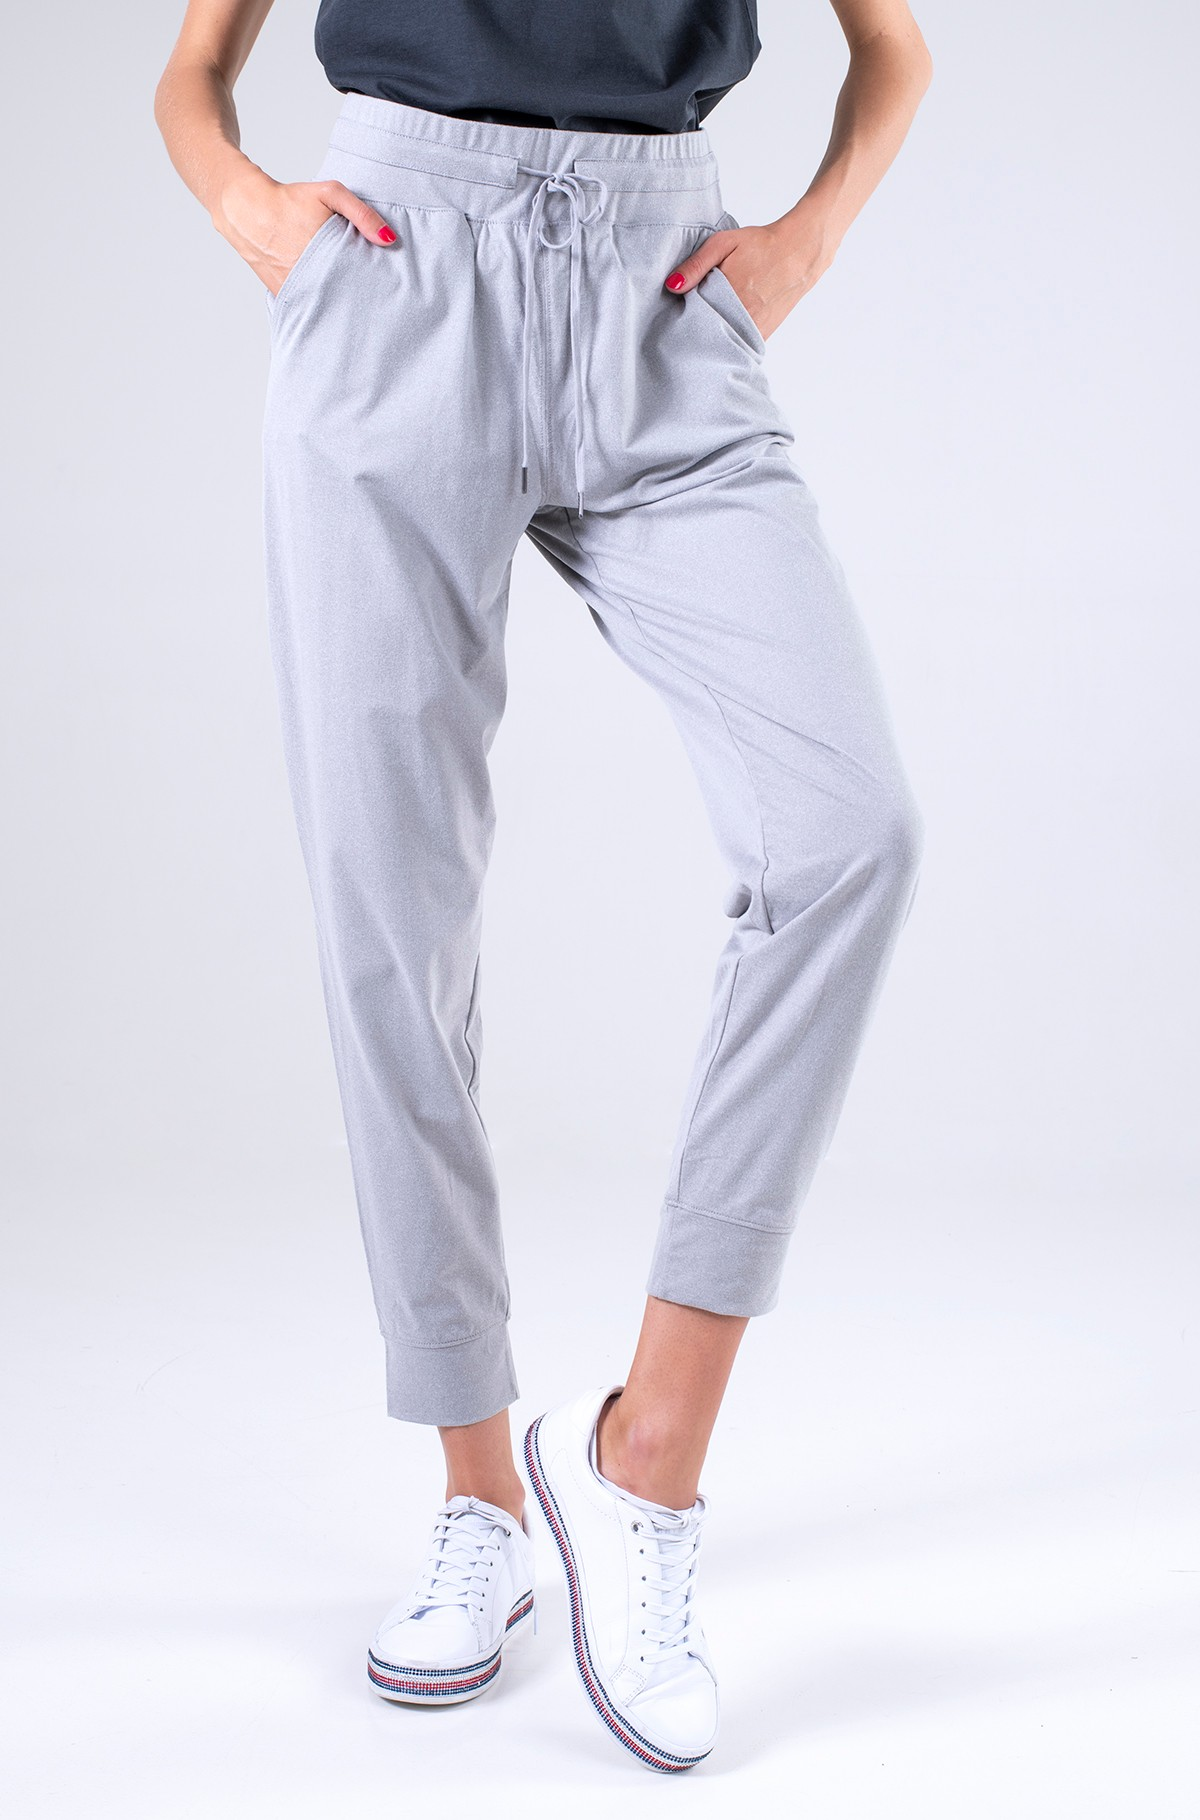 Fabric trousers 046-0329-4337-full-1